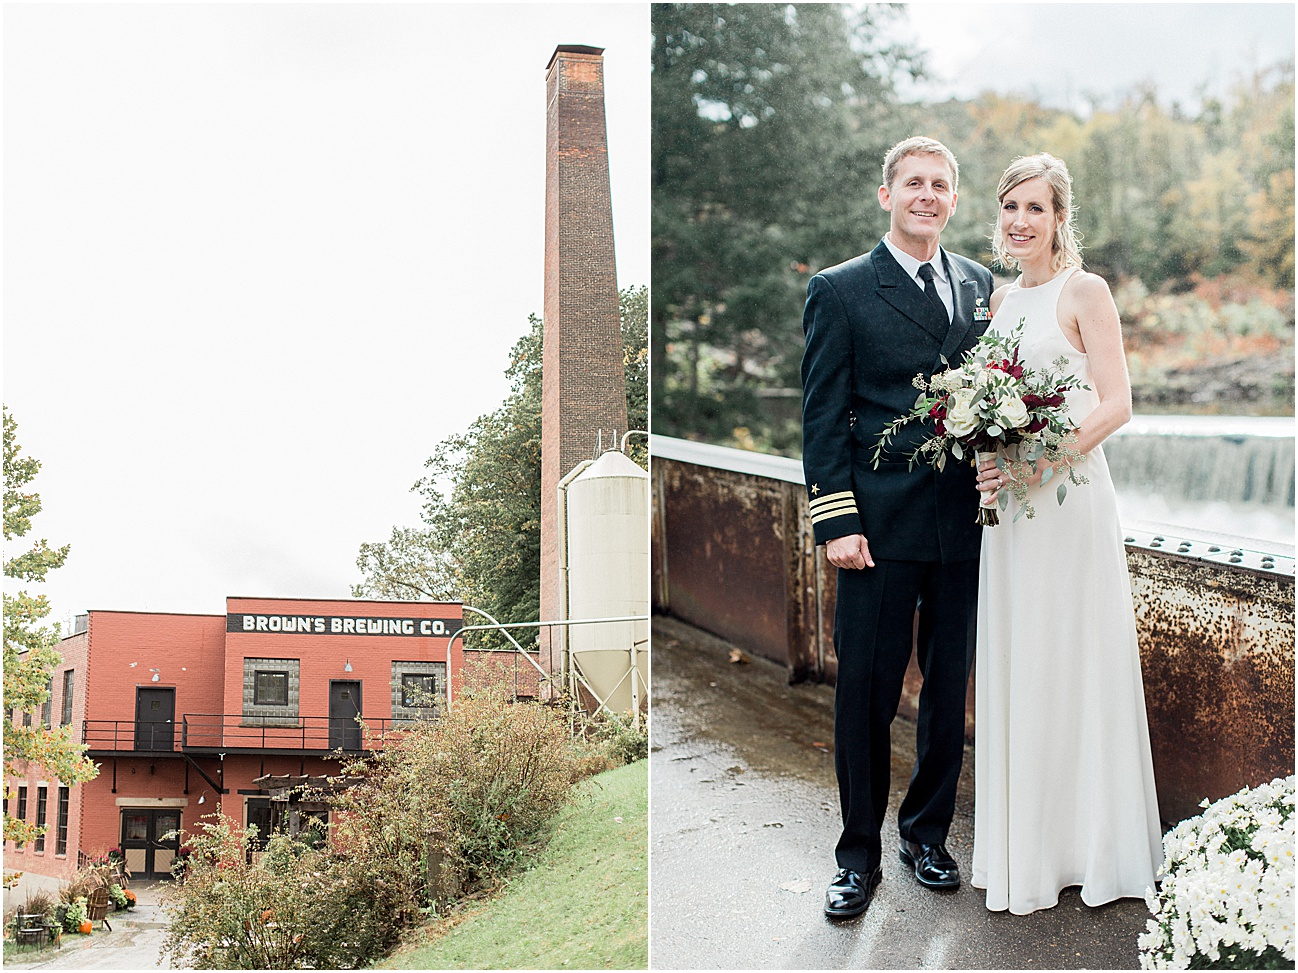 lauren_john_jon_ablany_browns_brewery_moses_farm_fall_cape_cod_boston_wedding_photographer_meredith_jane_photography_photo_1506.jpg